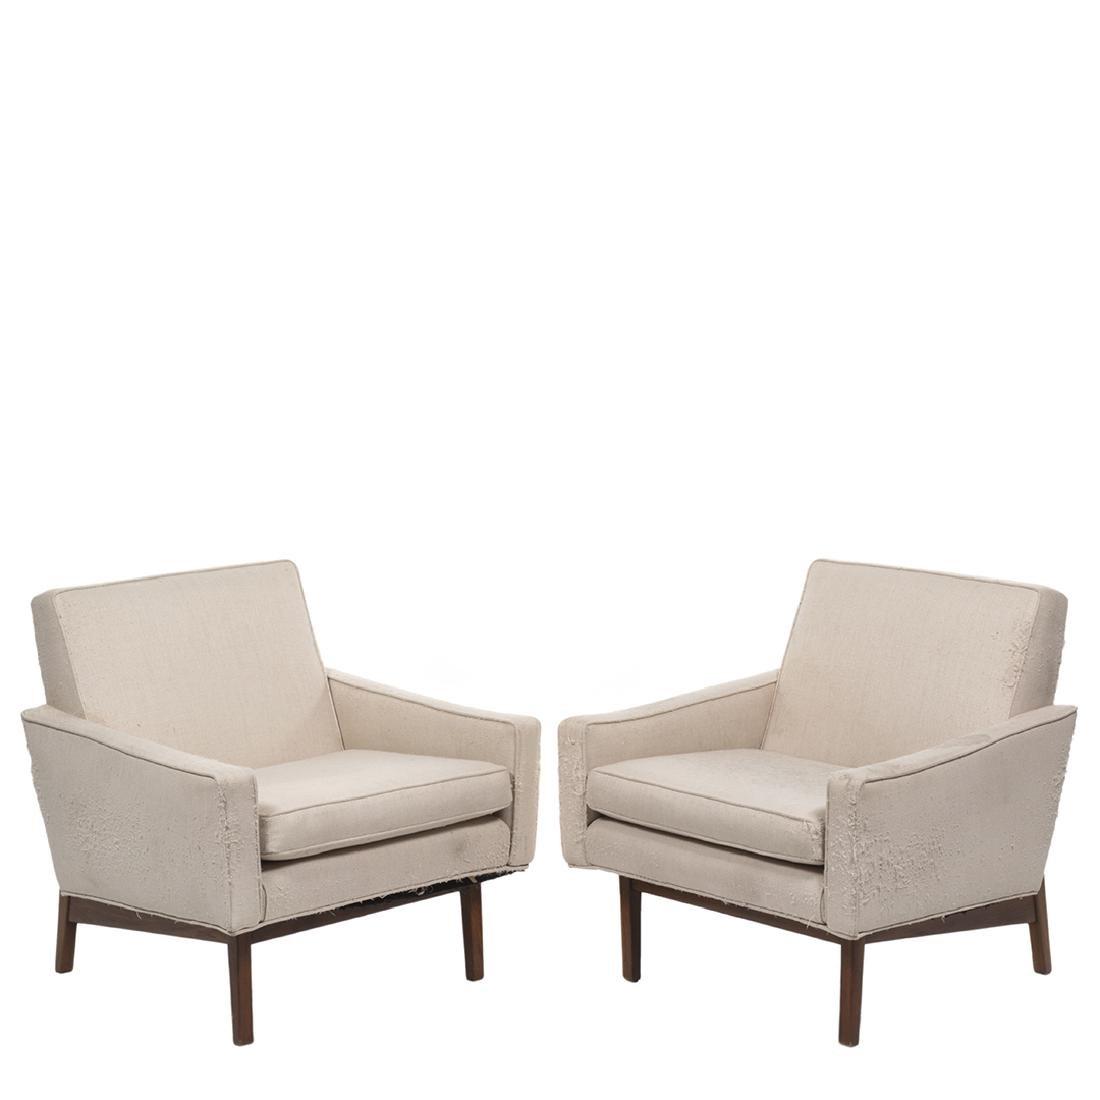 Jens Risom Lounge Chairs (2)